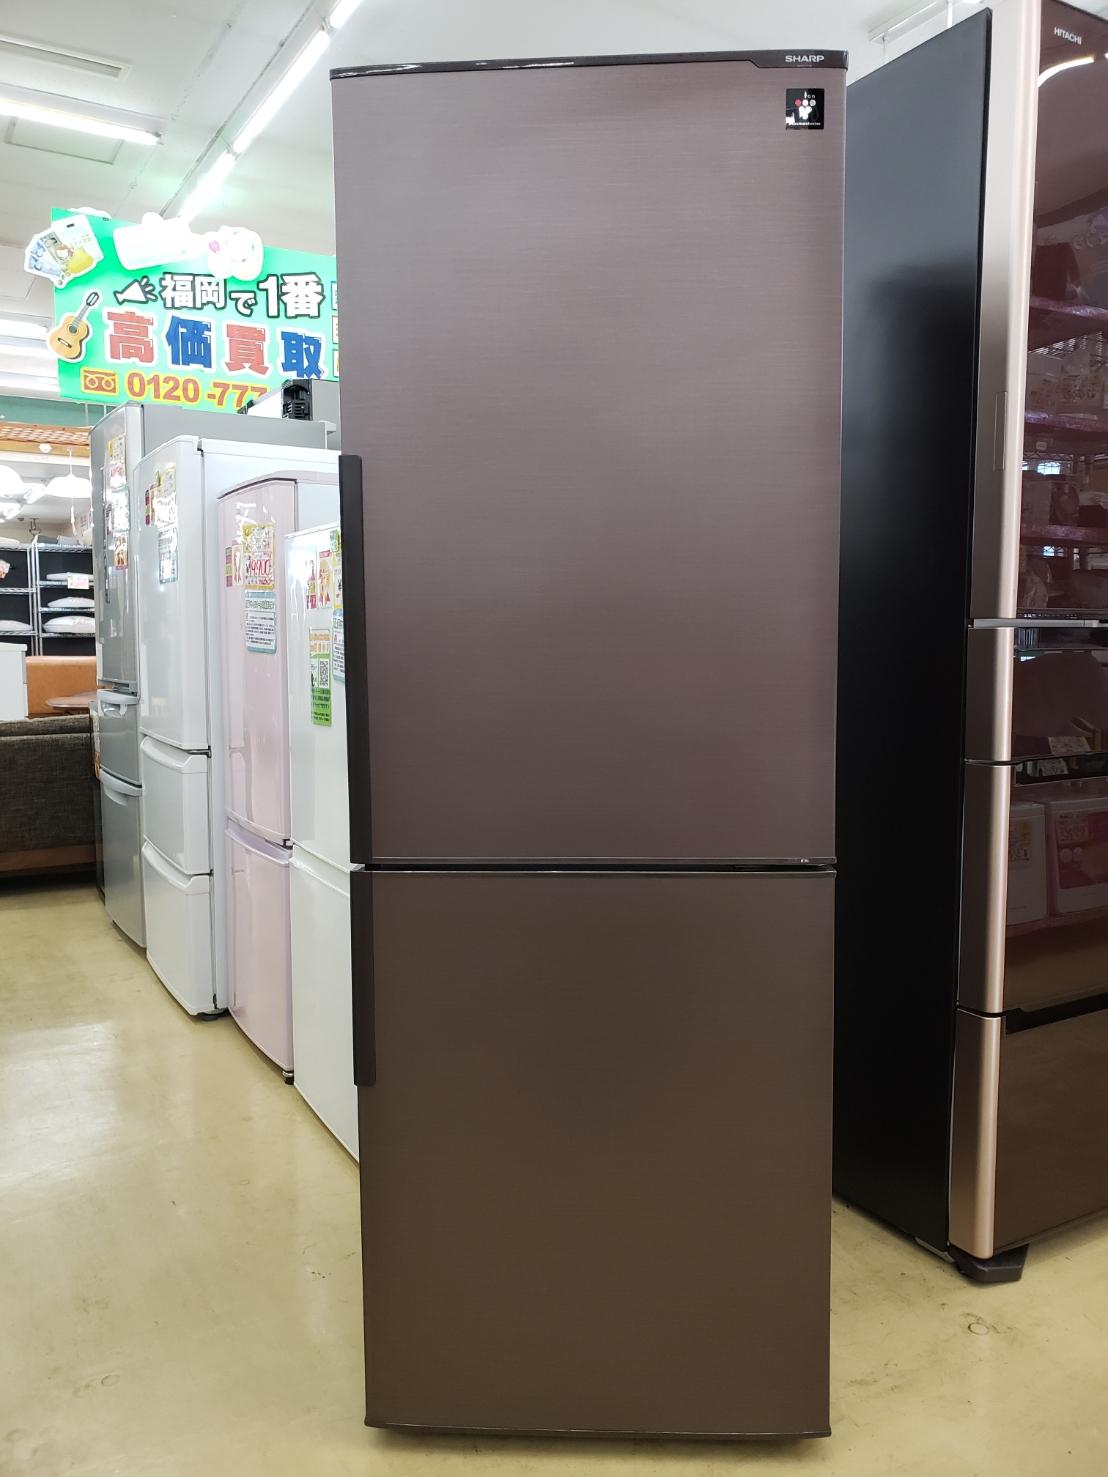 SHARP / シャープ 271L 冷蔵庫 2015年製 SJ-PD27A プラズマクラスター搭載 美品 買取致しました!の買取-